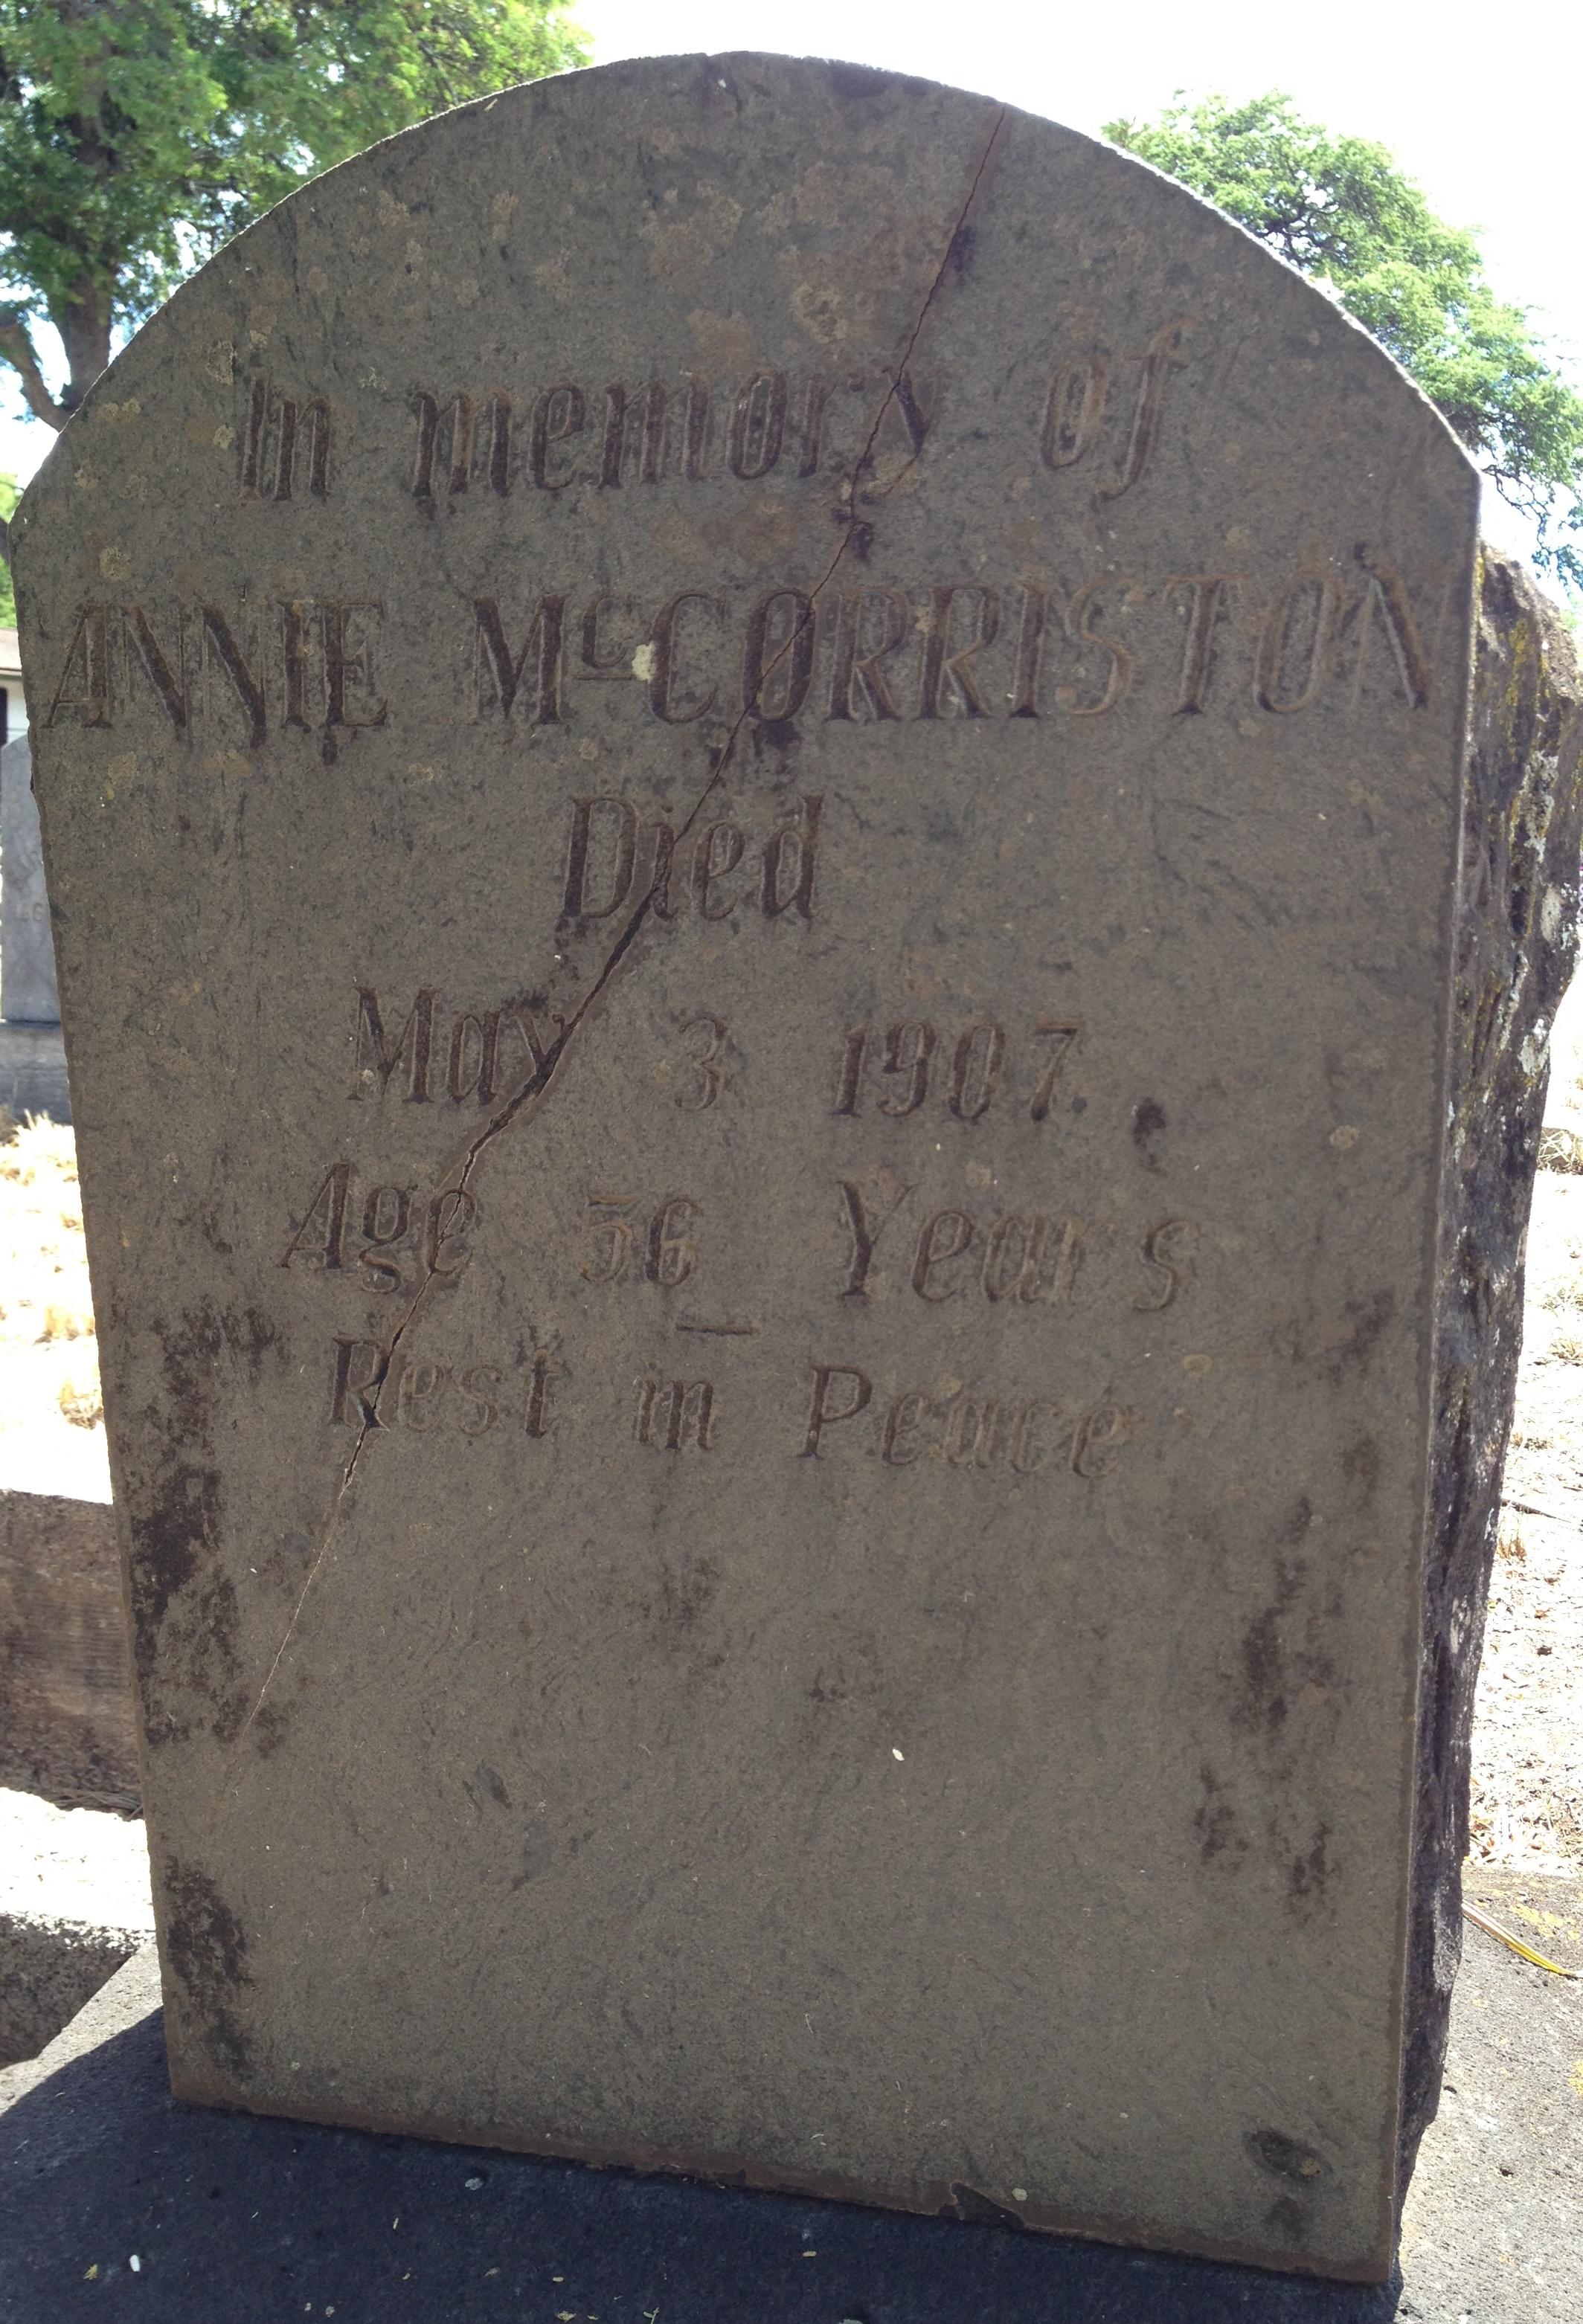 Anna McColgan McCorriston's Headstone